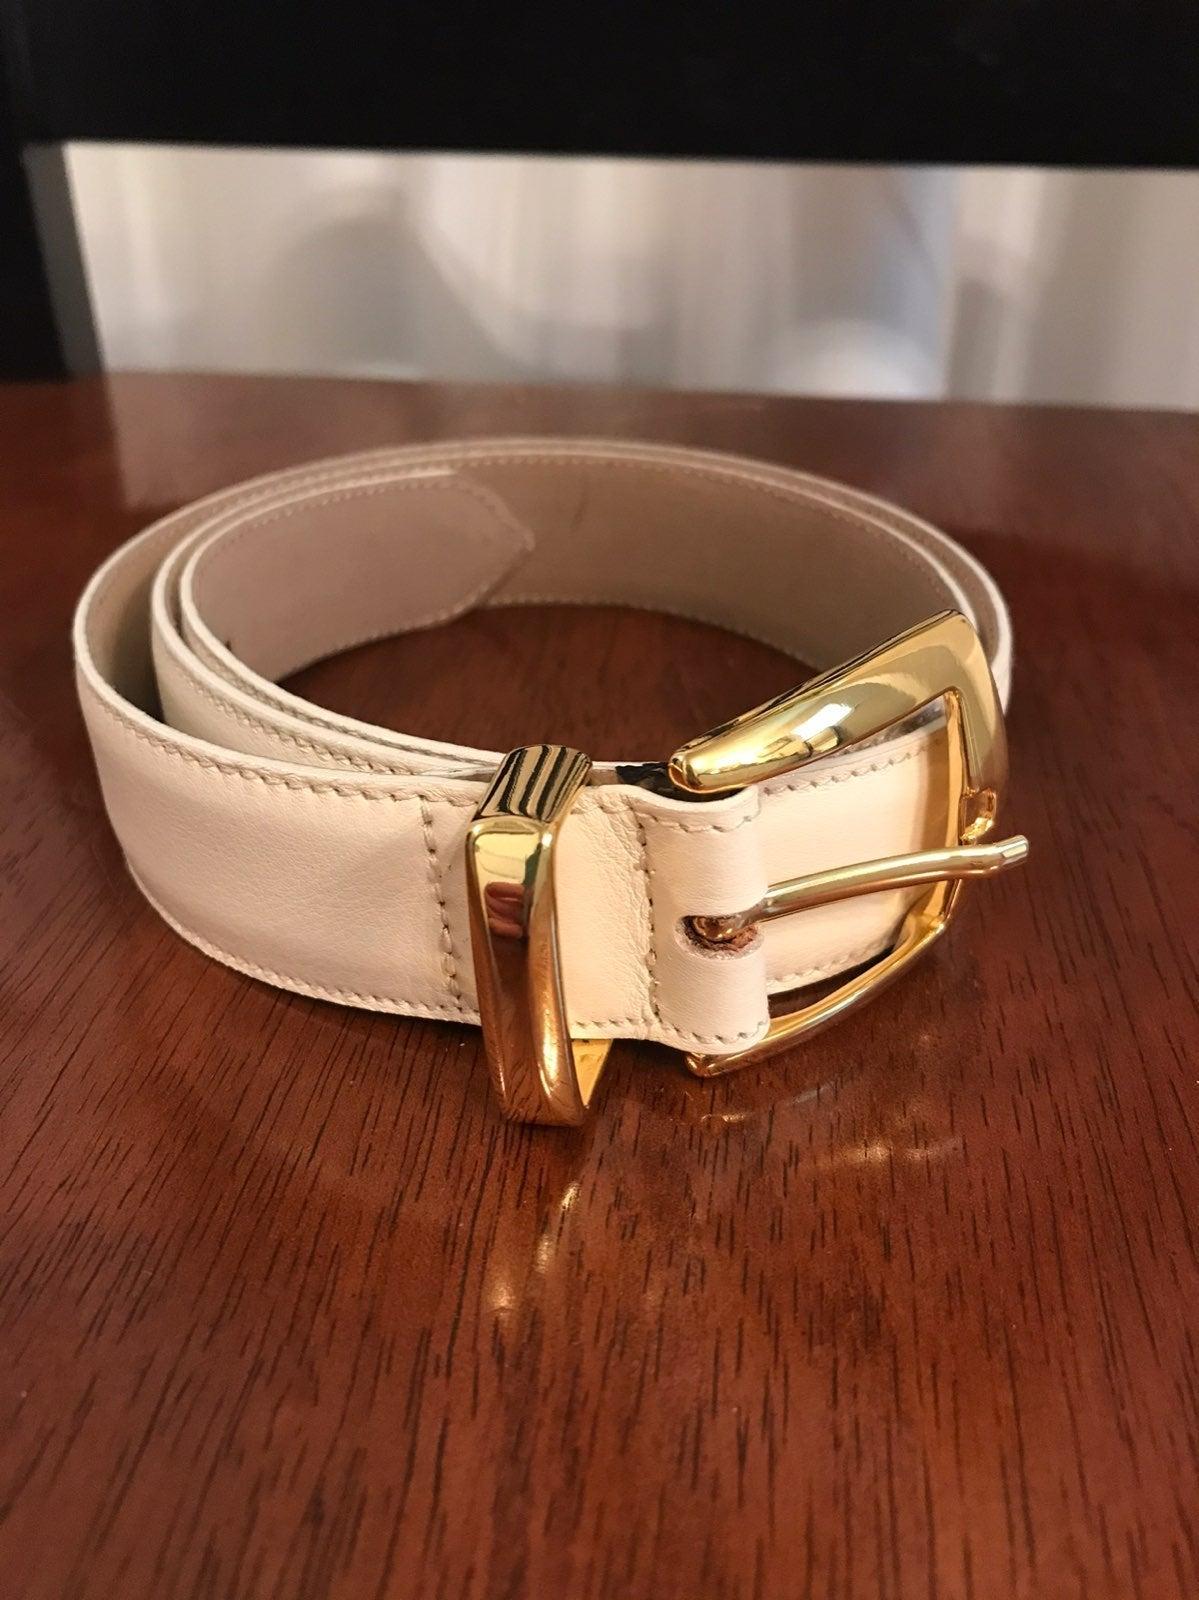 Talbots white leather belt